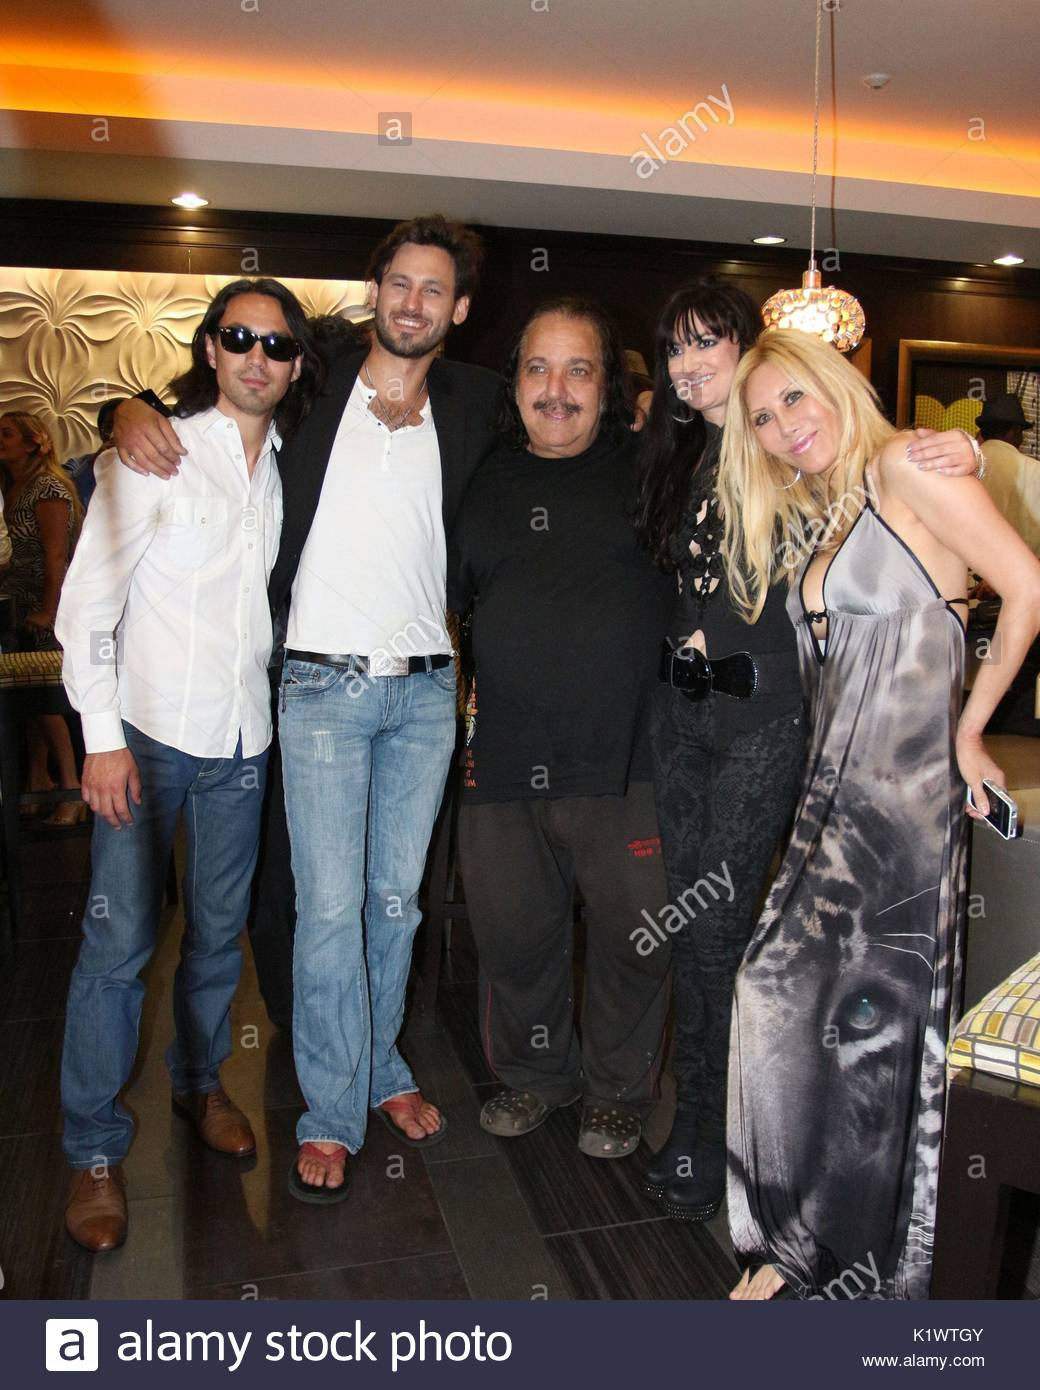 'Celebrity Rehab' Star Shifty Shellshock -- Arrested for ...